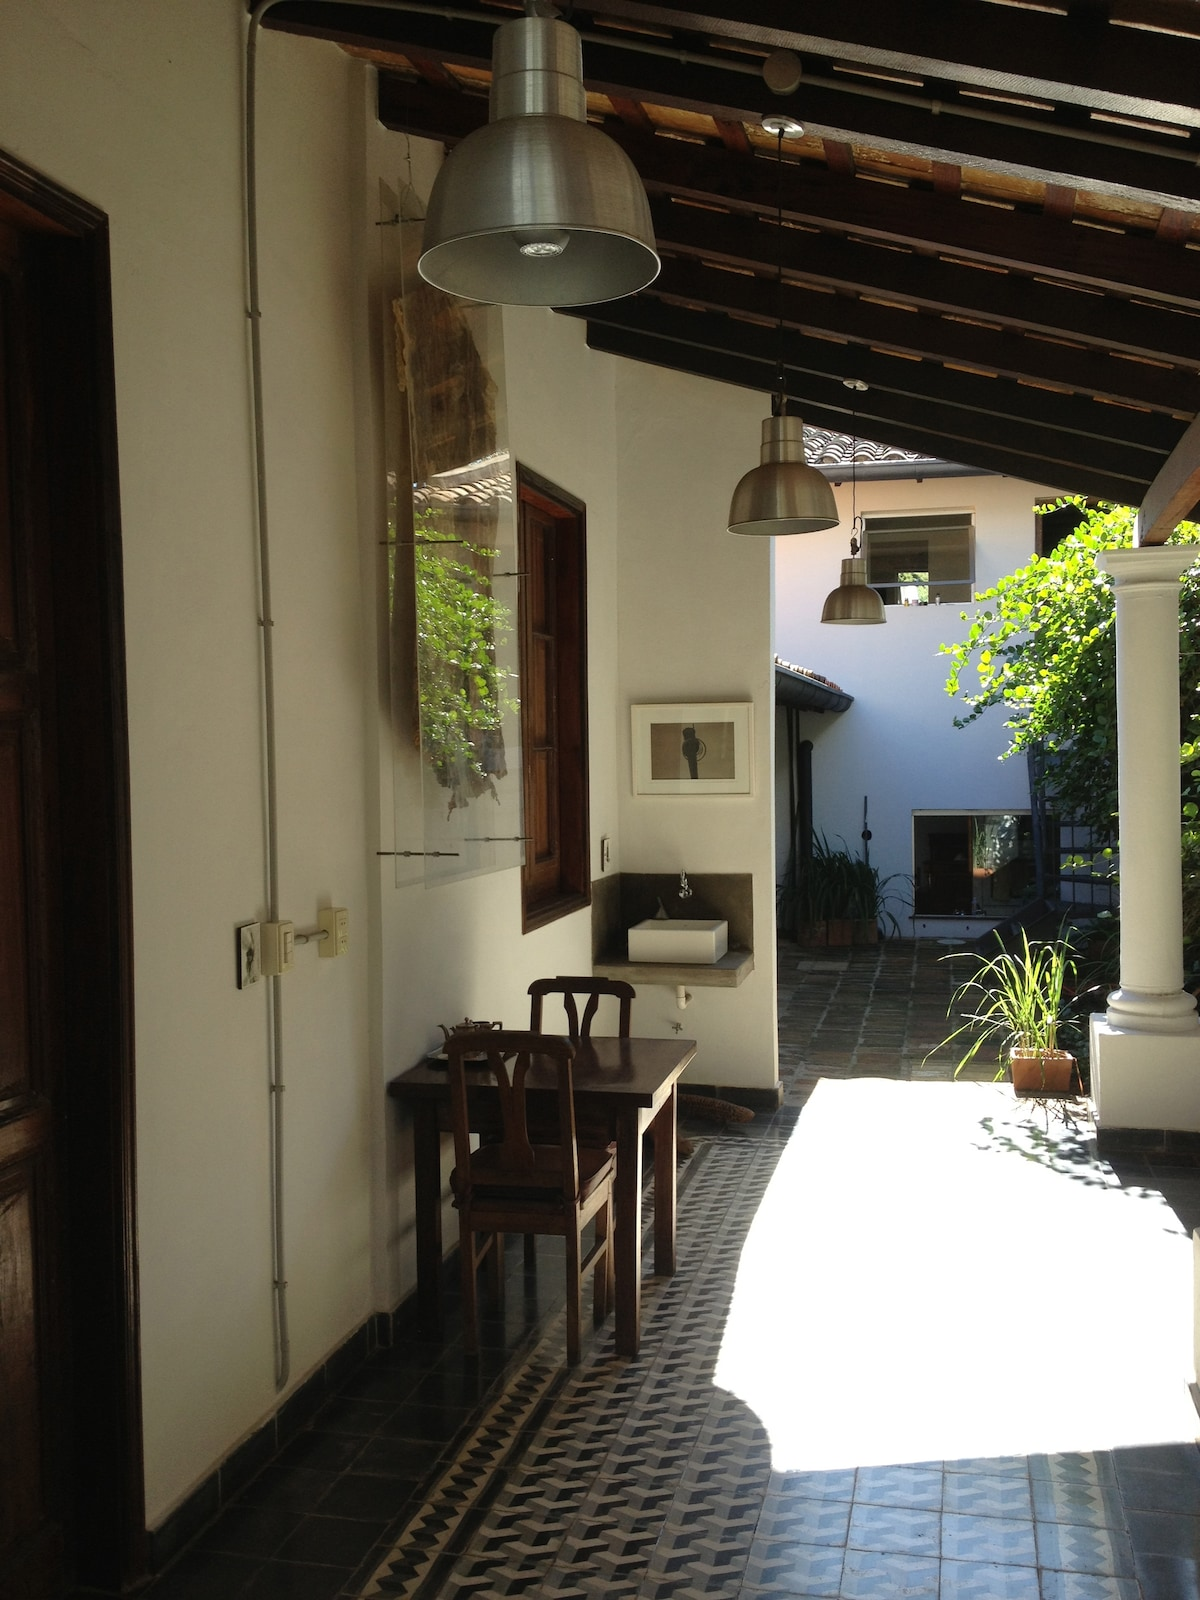 Main entrance / Access to Room 1